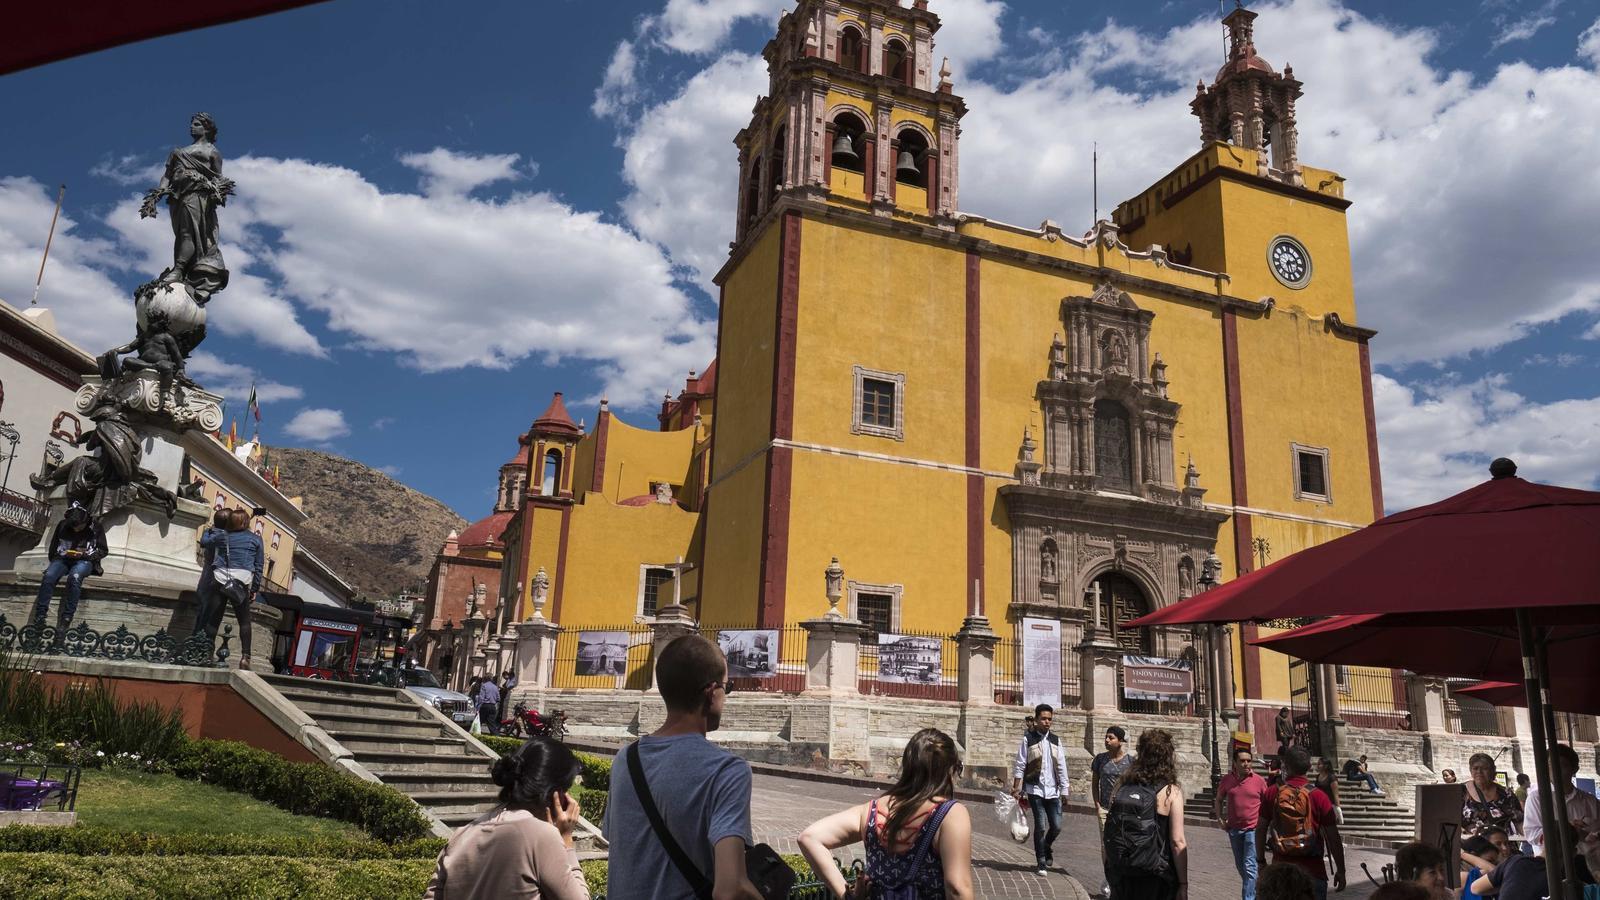 Les seves esglésies, com la basílica de Nuestra Señora de Guanajuato